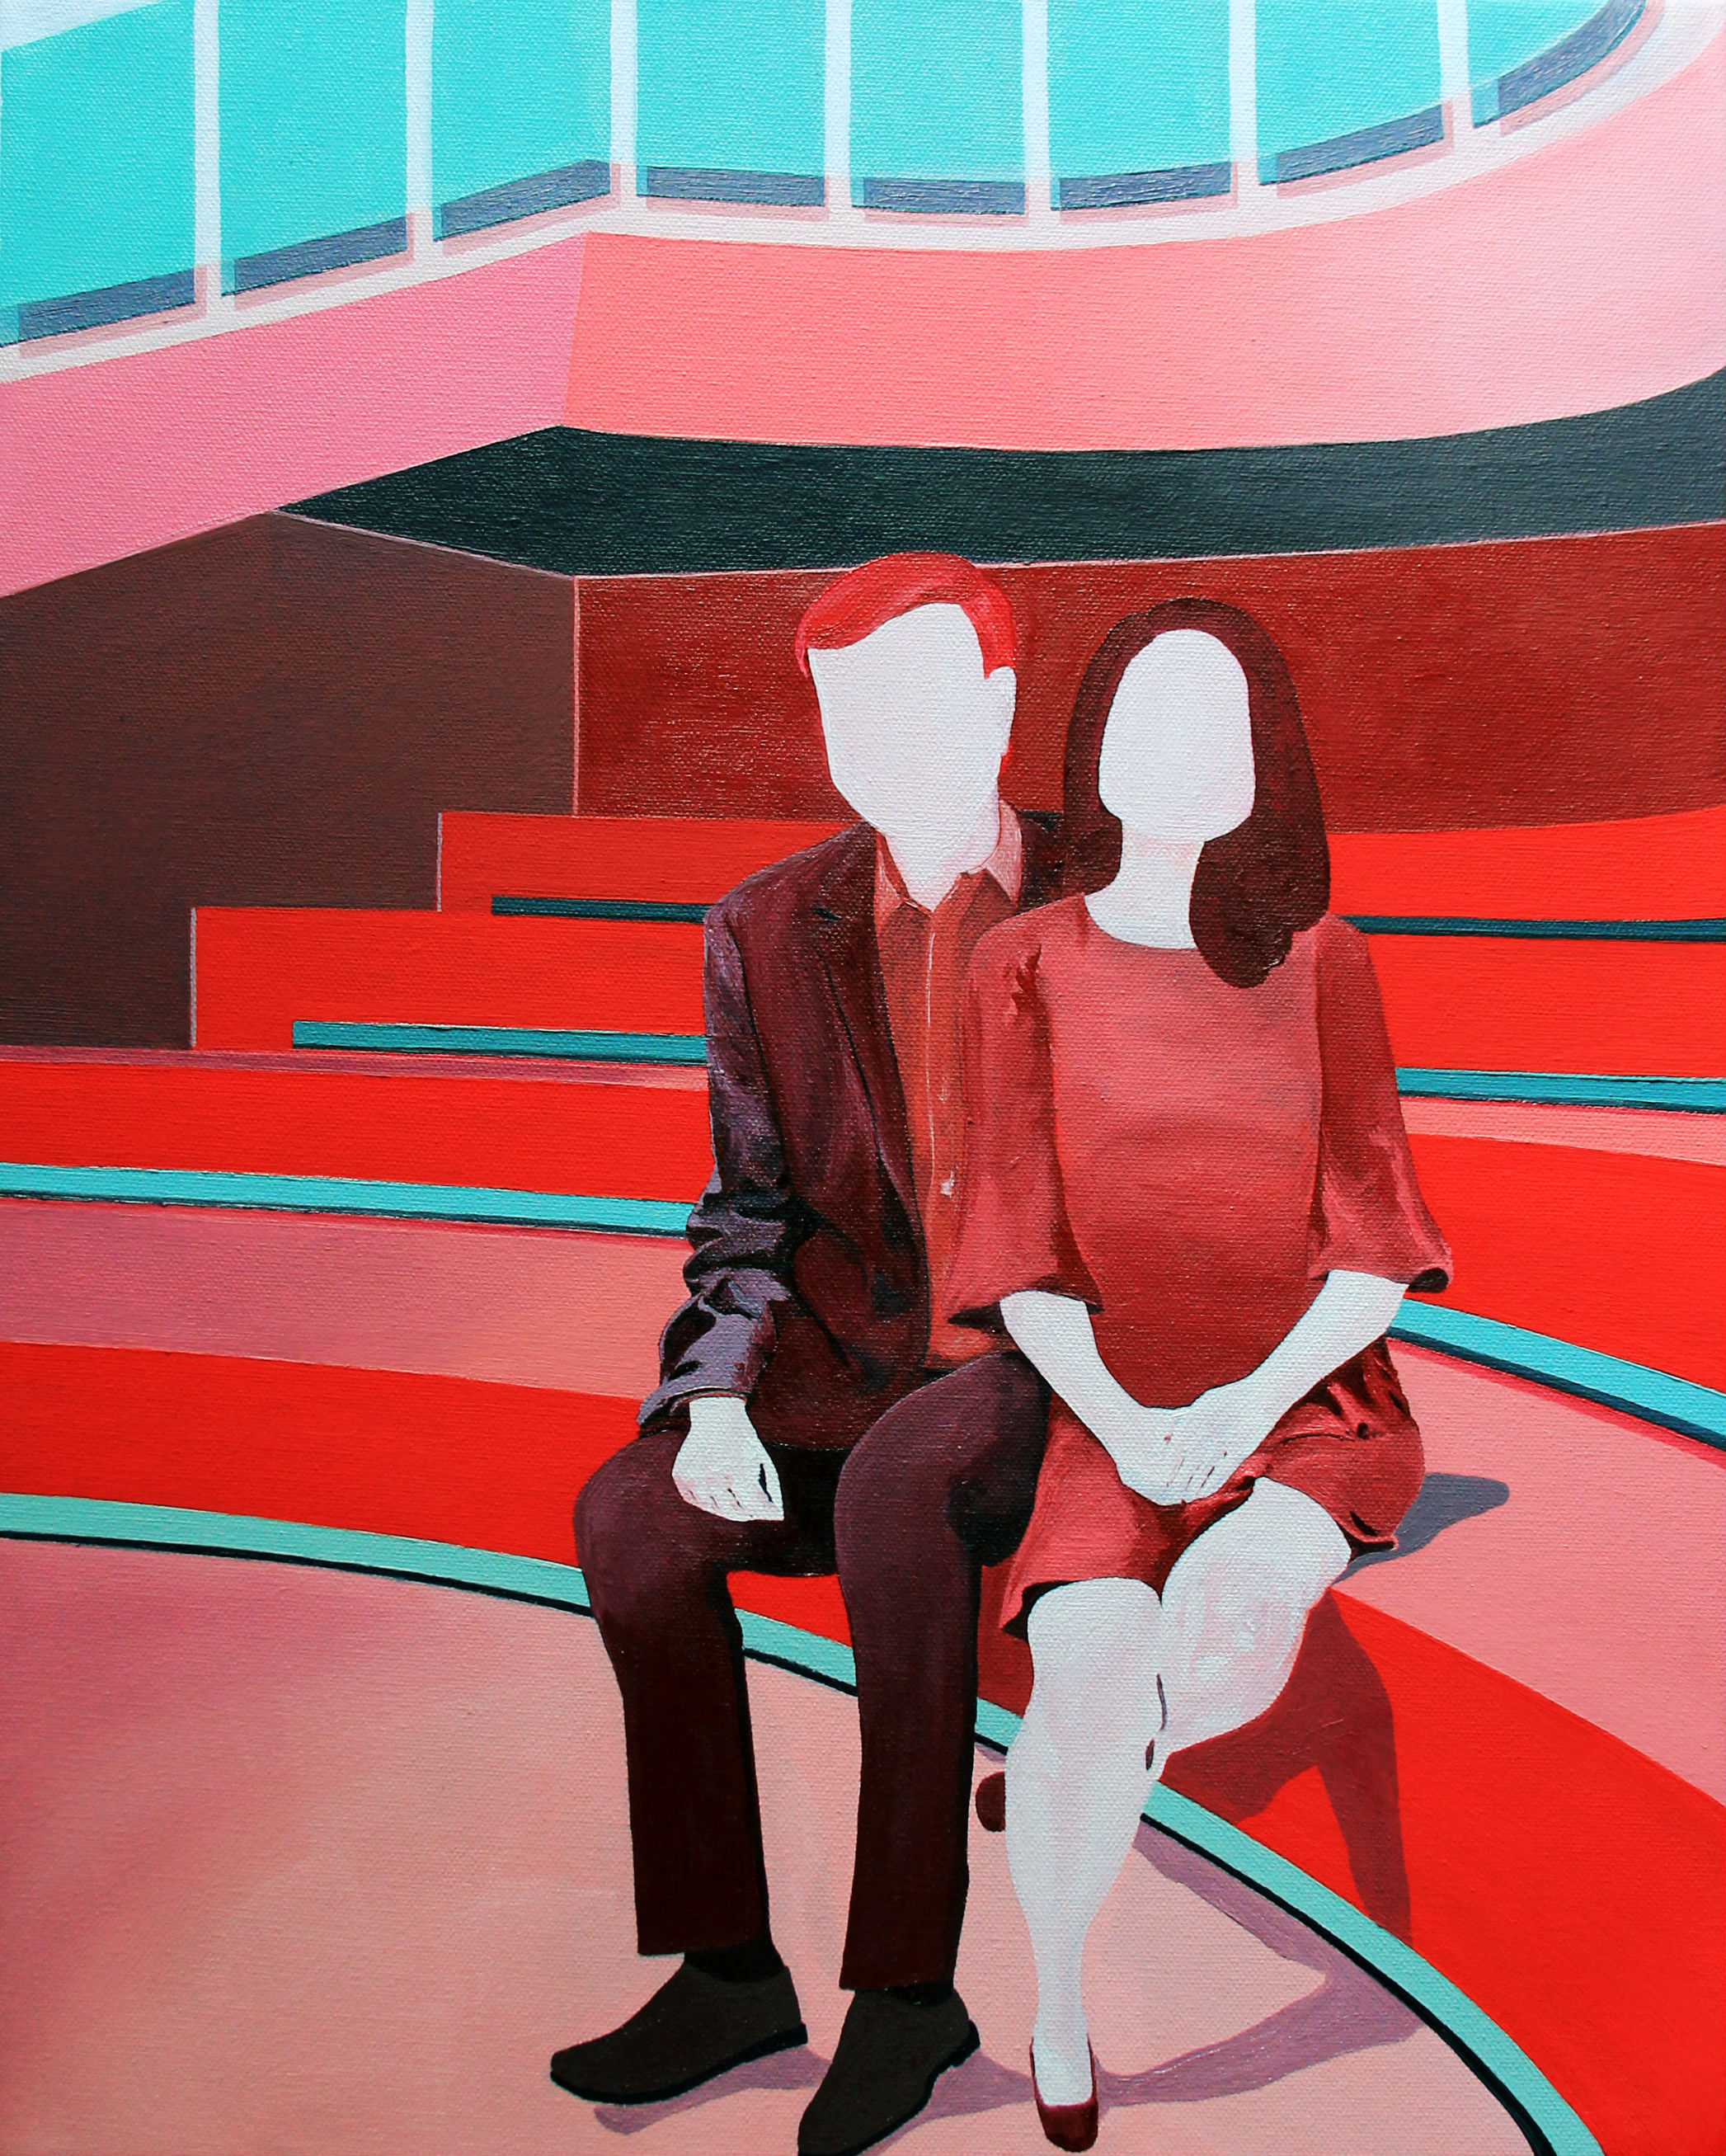 The Holekamps by Diana Zeng